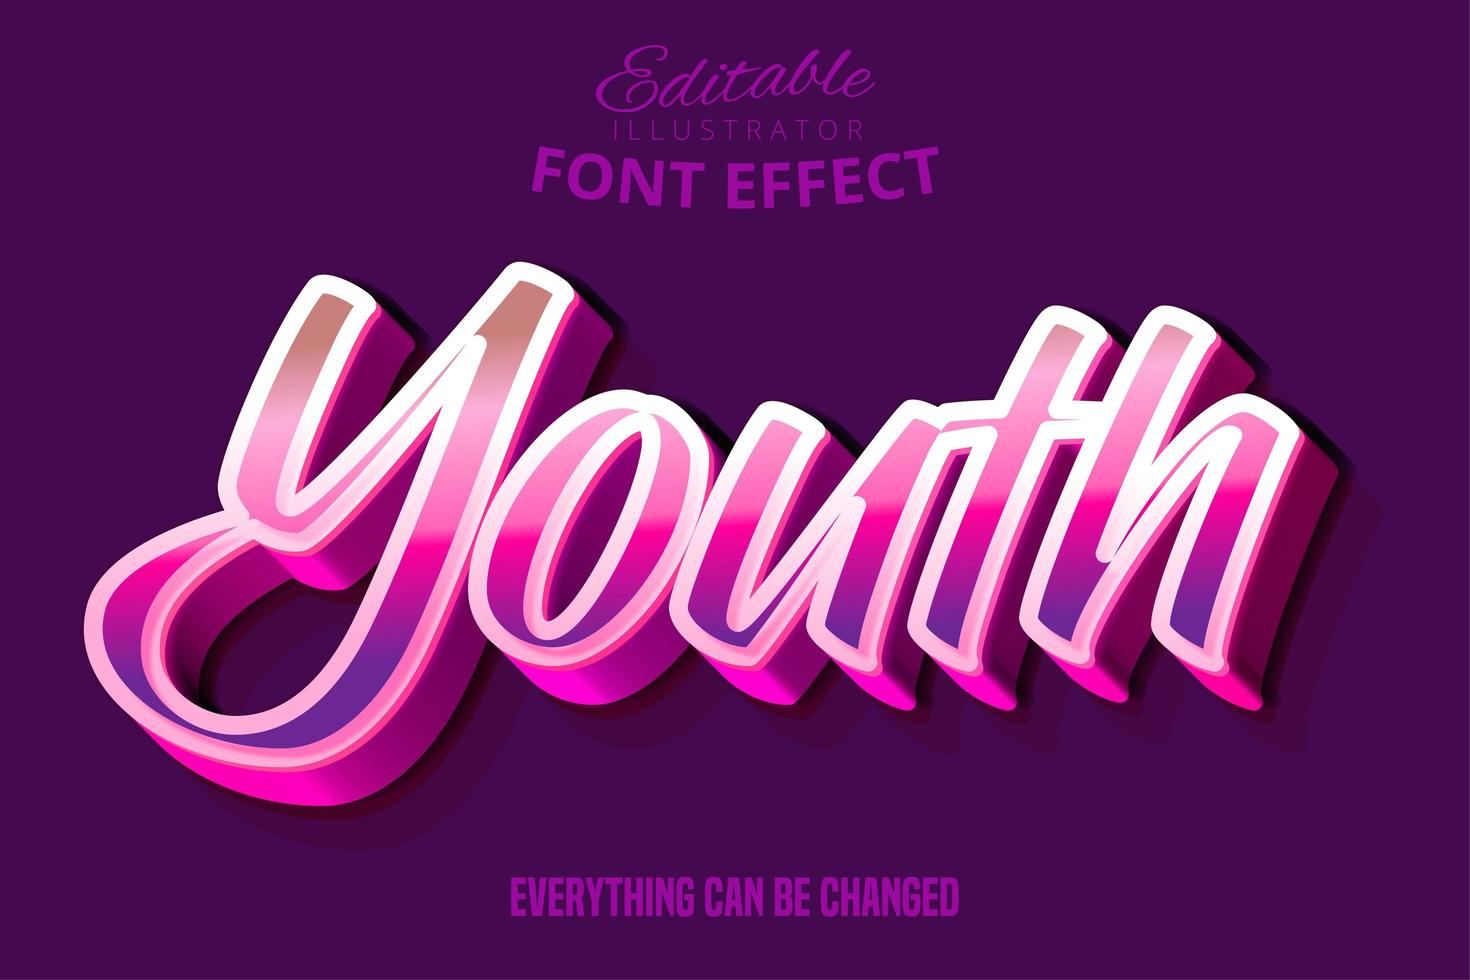 Editierbarer Typografie-Gusseffekt des modernen Jugendskripts vektor